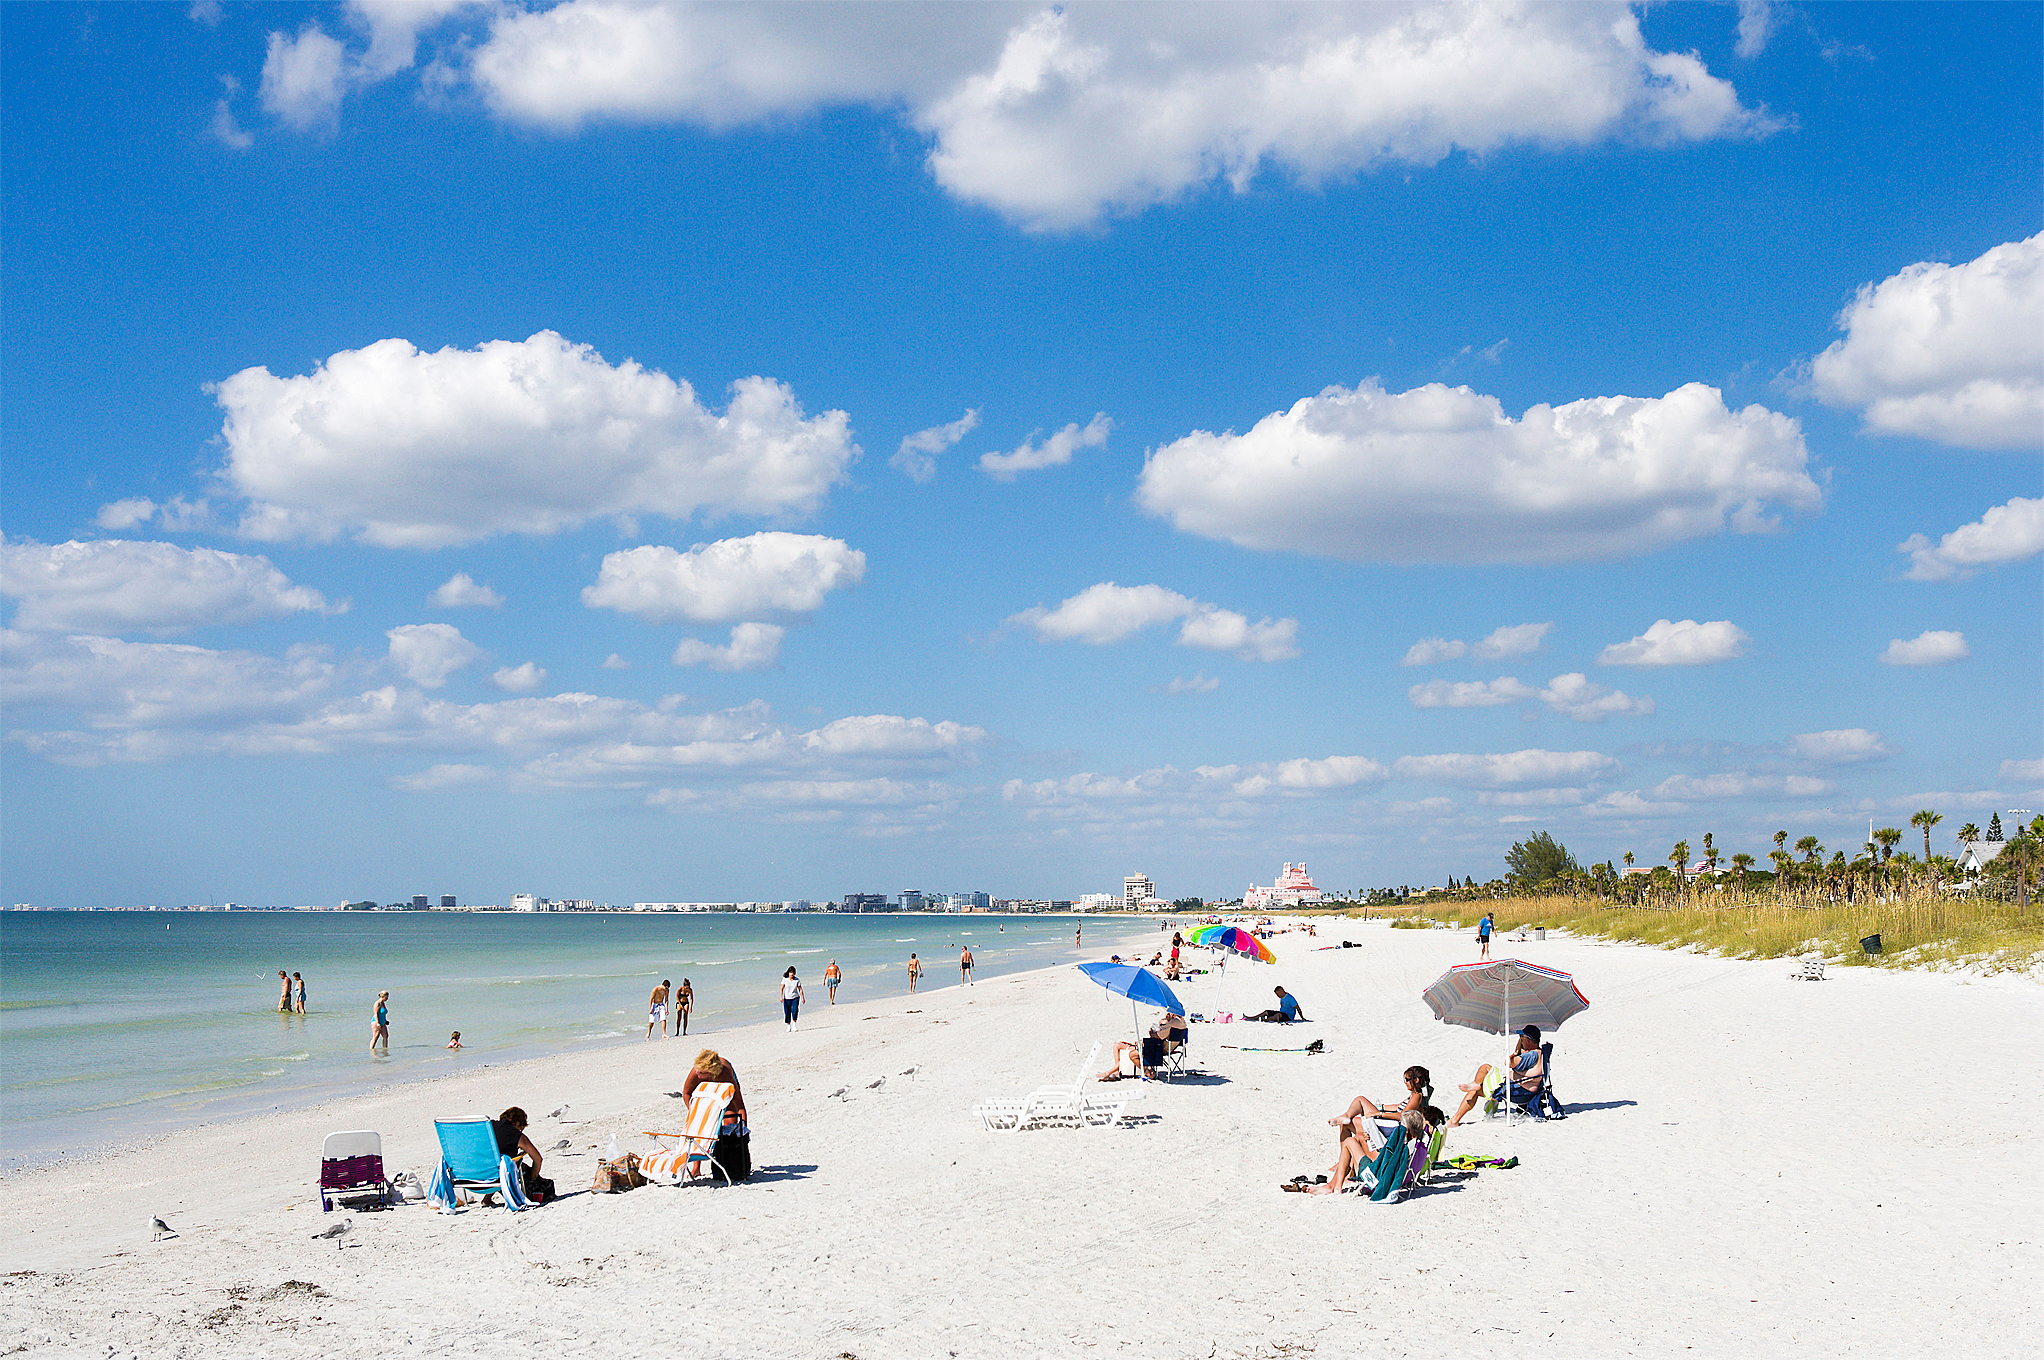 Beach at Pass a Grille, St Pete Beach, Gulf Coast, Florida, USA.